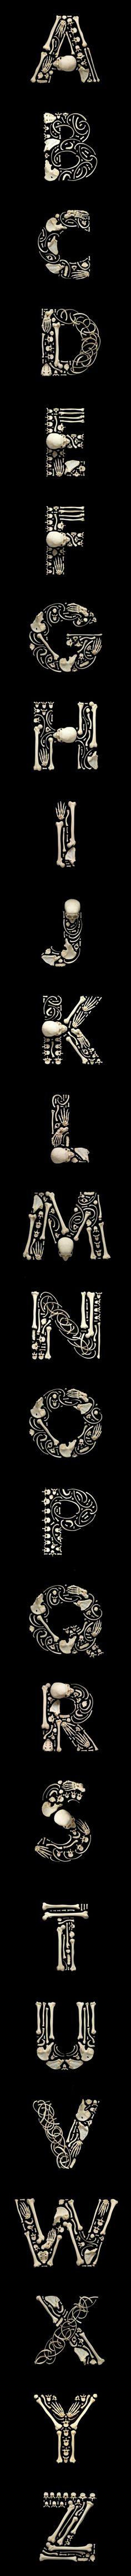 Bones type, by designer & photographer Francois Robert